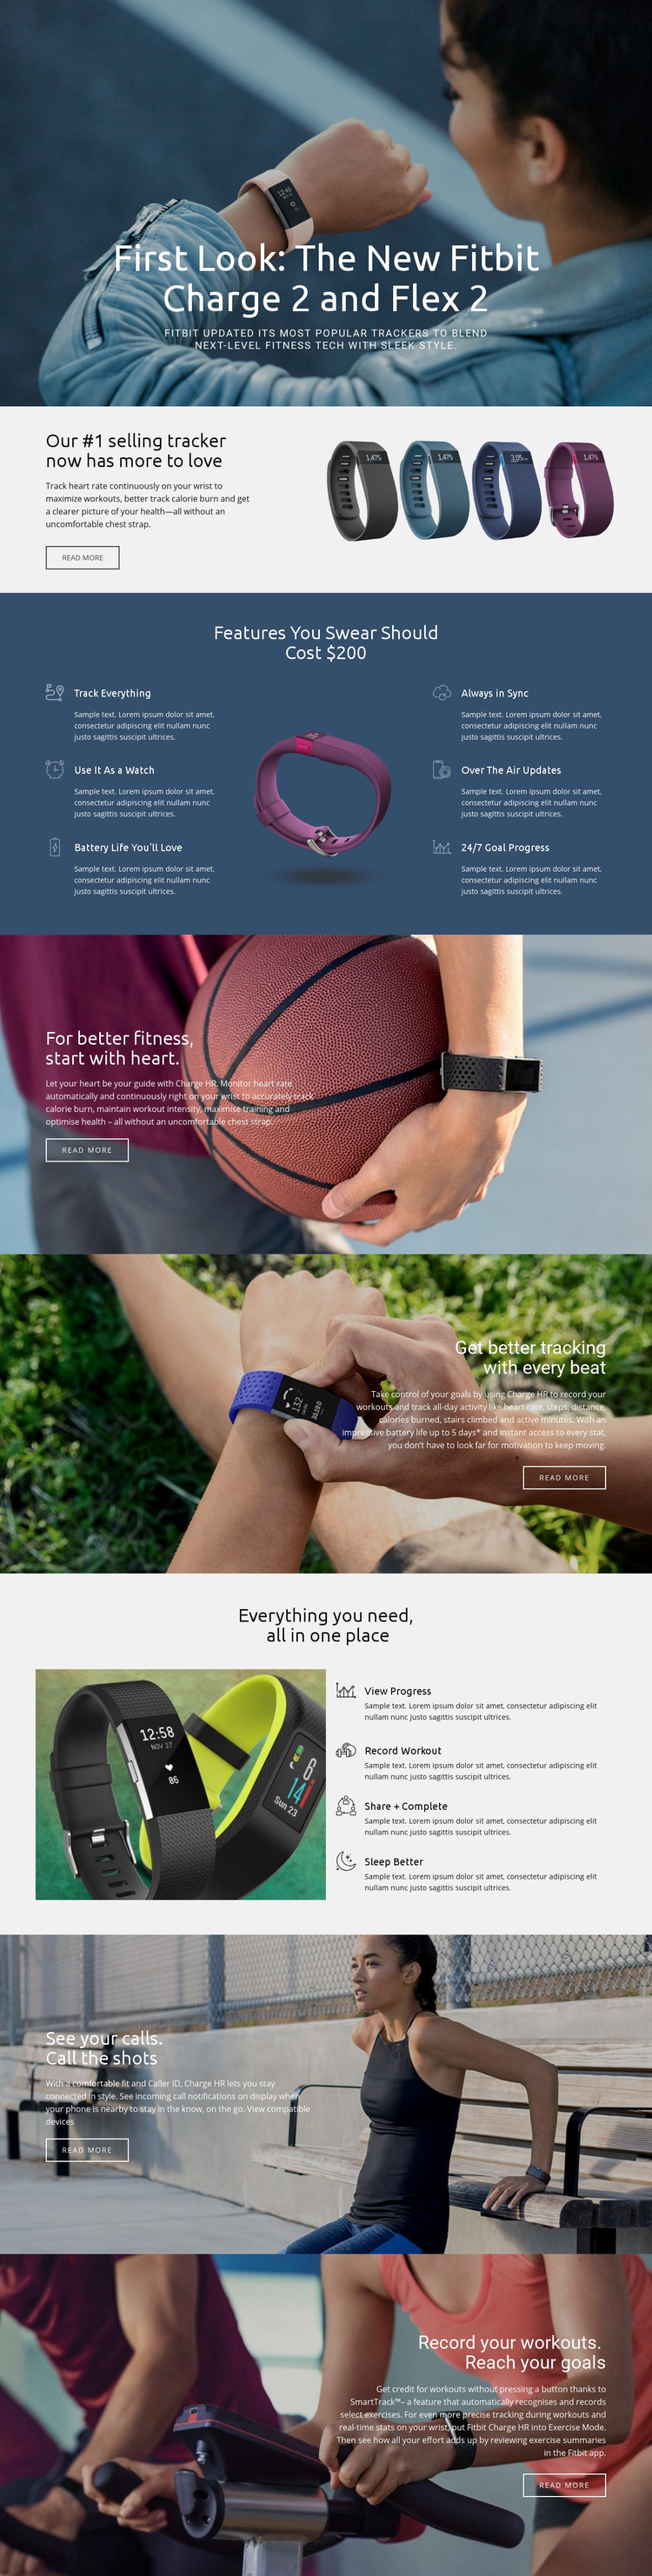 Flex 2 Web Page Designer